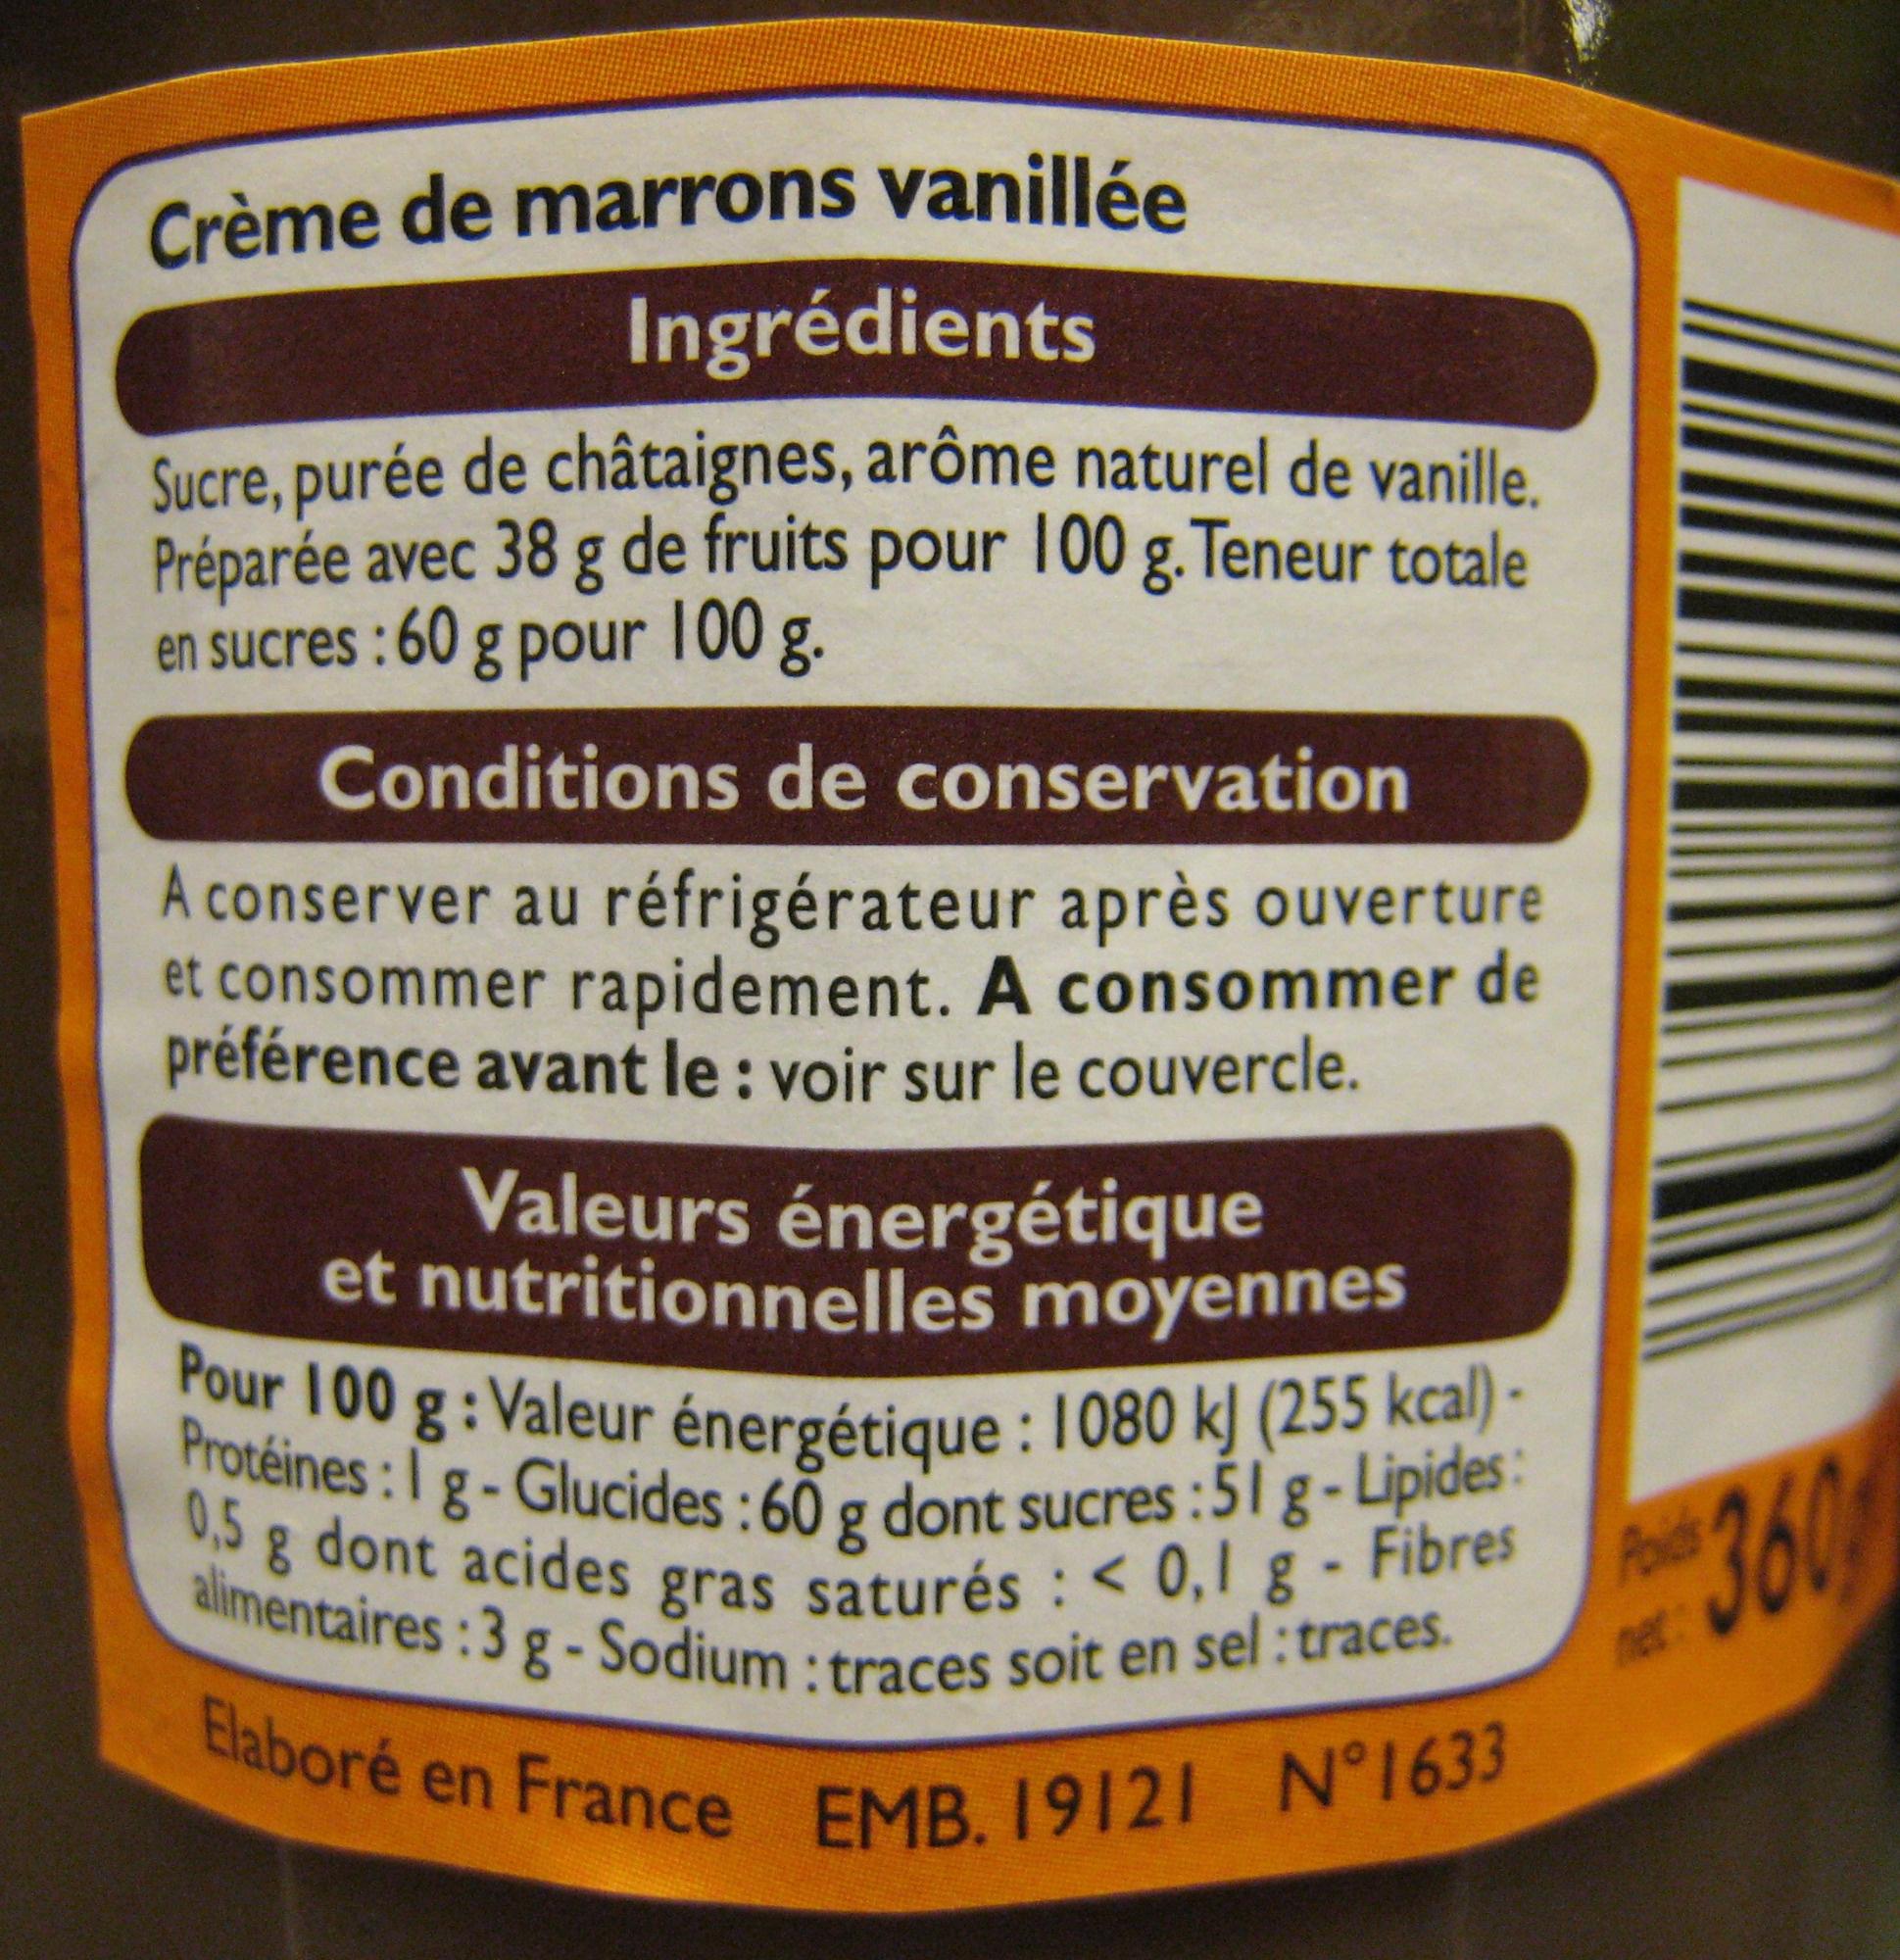 Crème de marrons vanillée - Ingredients